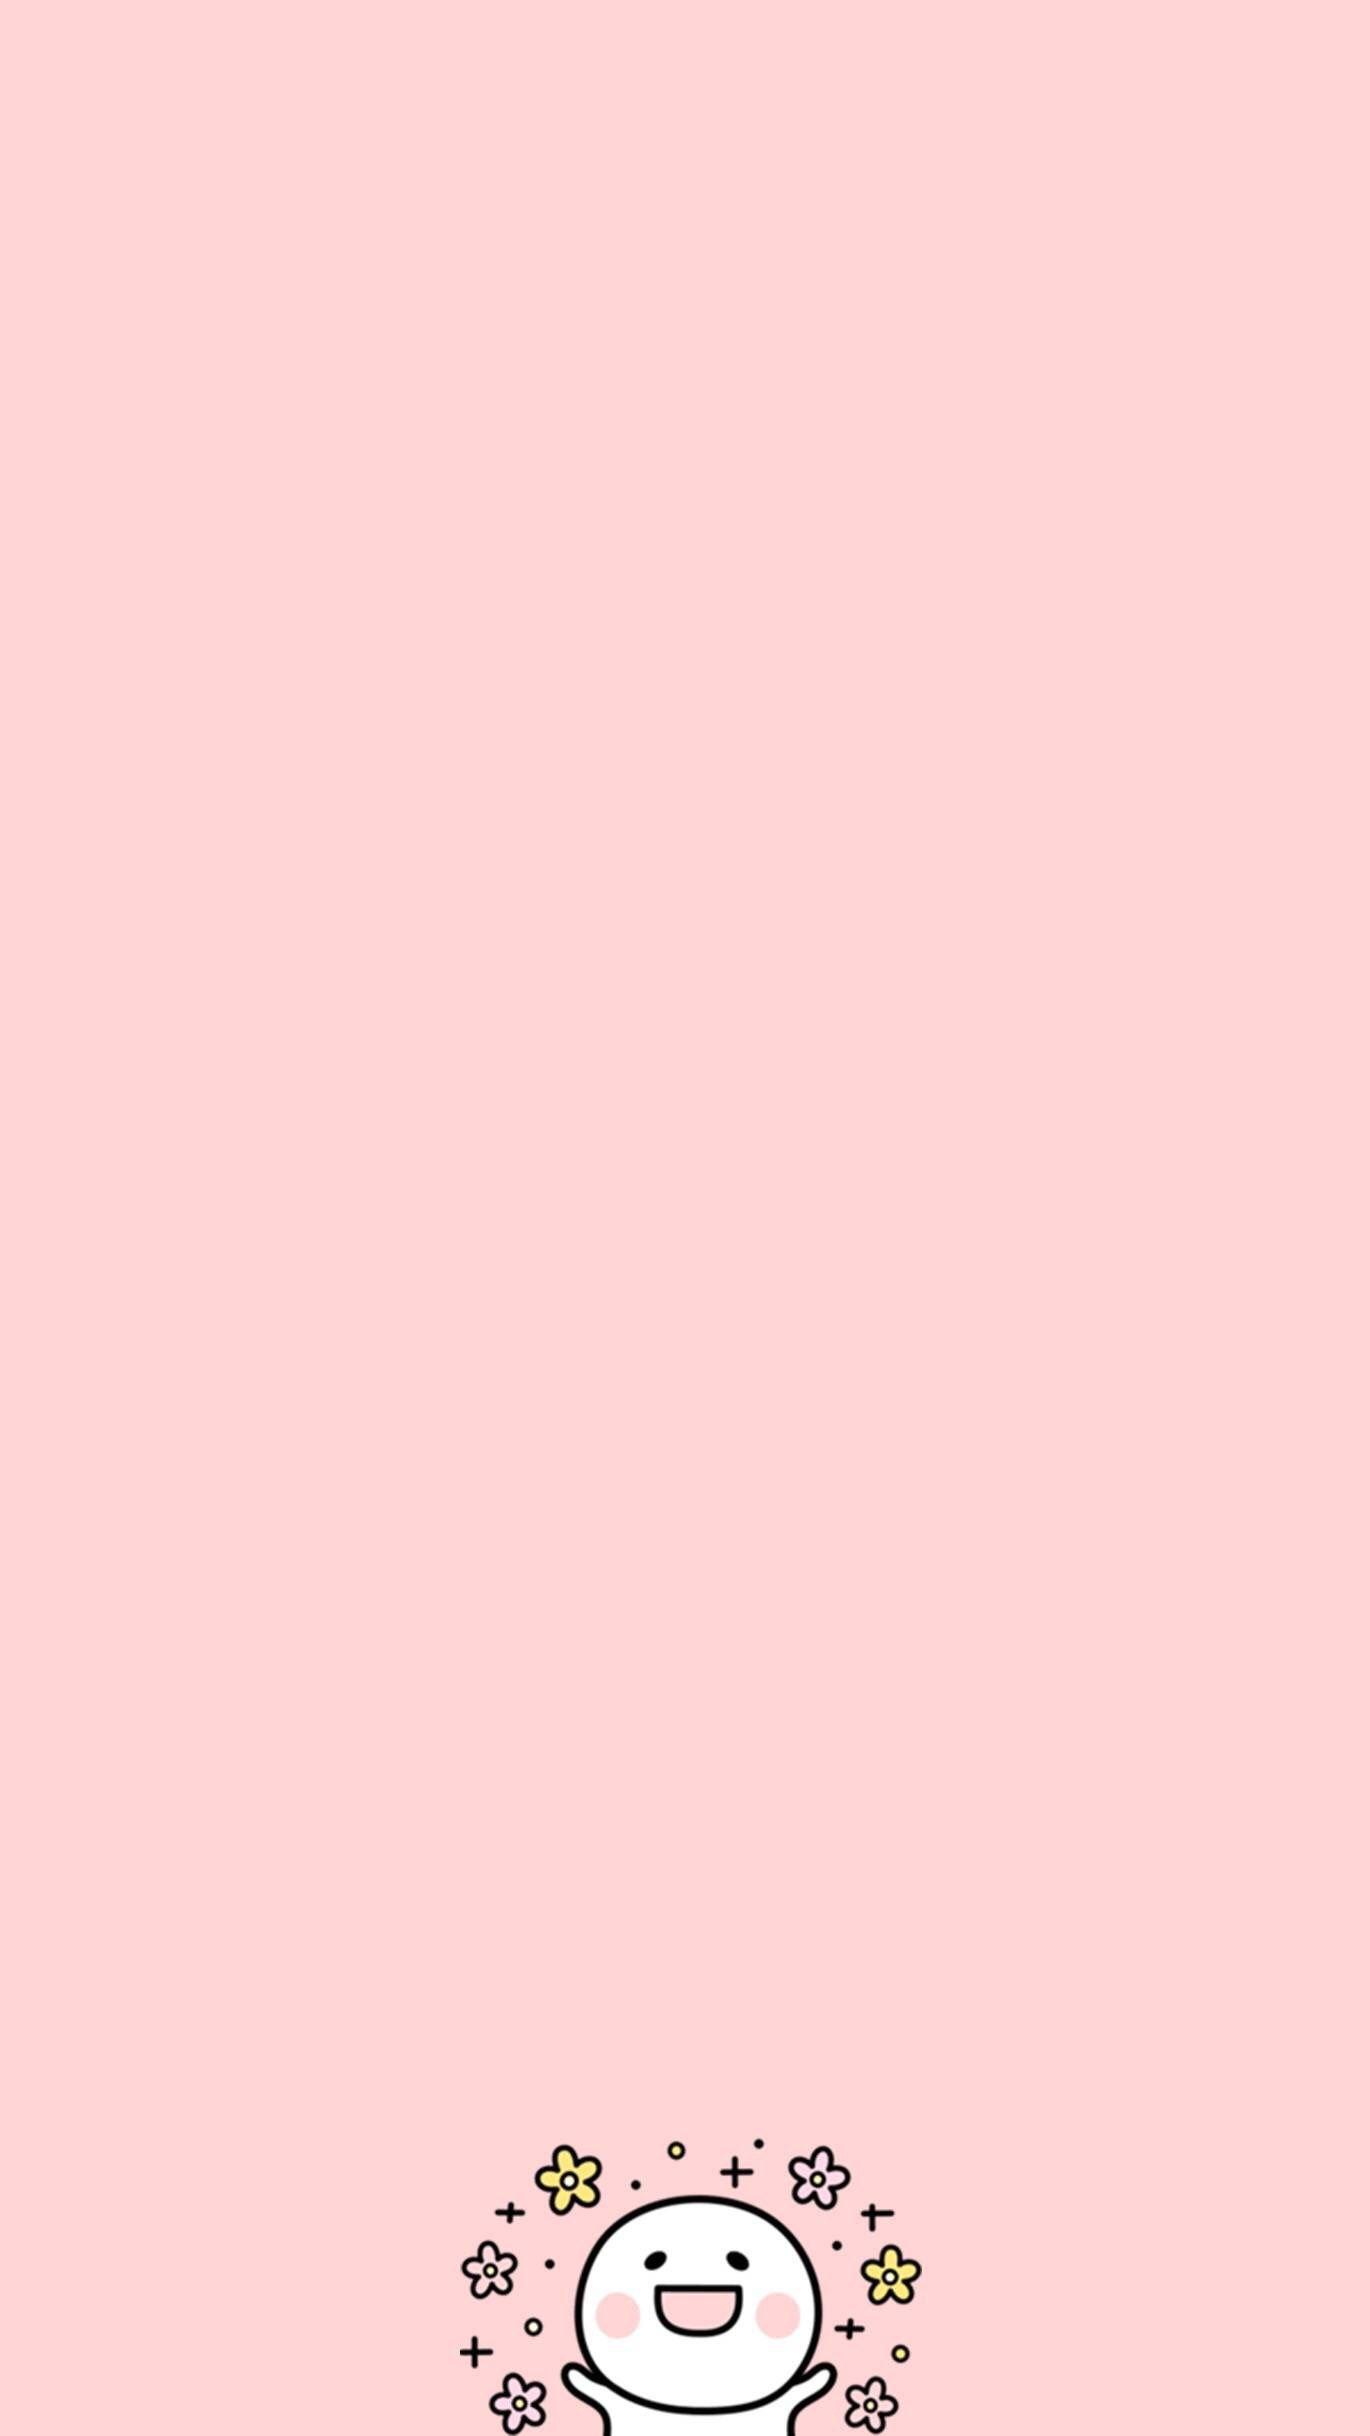 Nuances De Couleur Rose Fond D Ecran Cellulaire 86 Inspirations De Fonds D Ecran Pour Wallpaper Iphone Cute Cute Tumblr Wallpaper Cute Cartoon Wallpapers